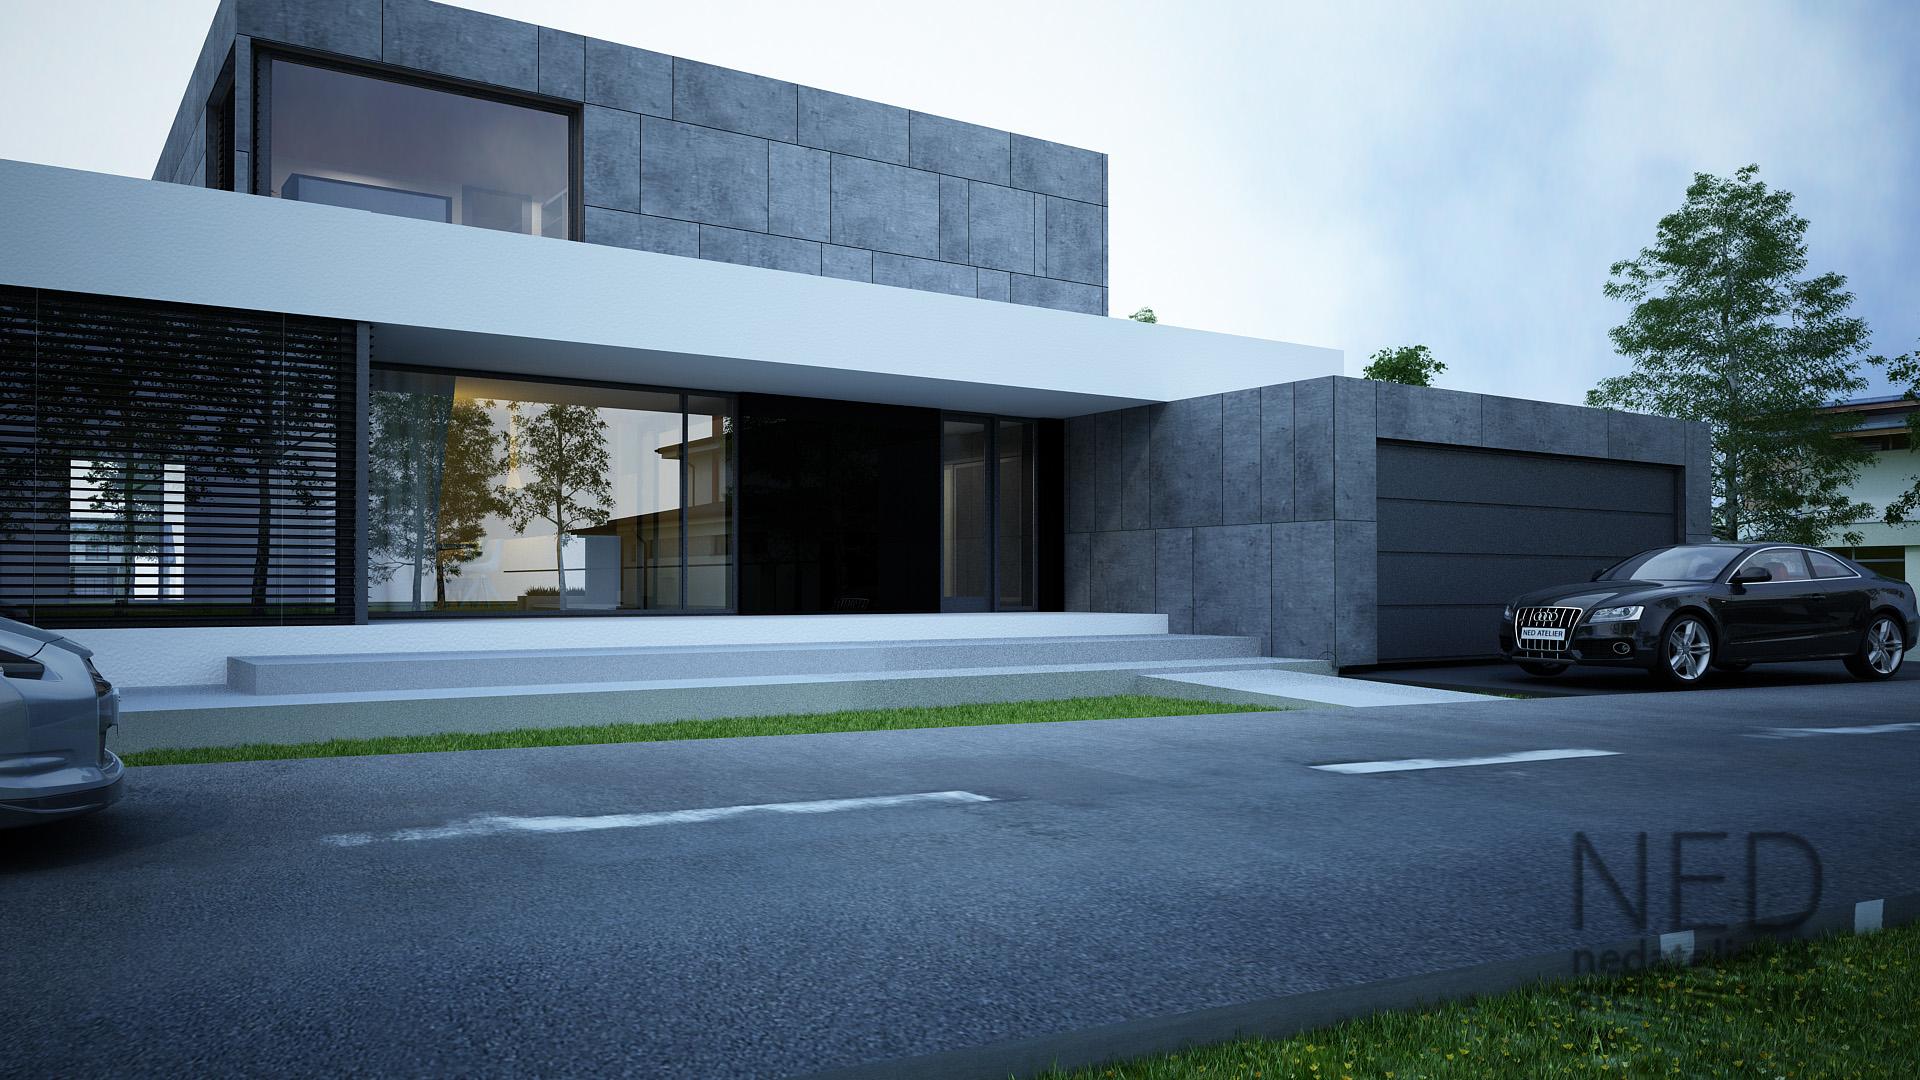 Projekty Domov Hlu Ned Atelier